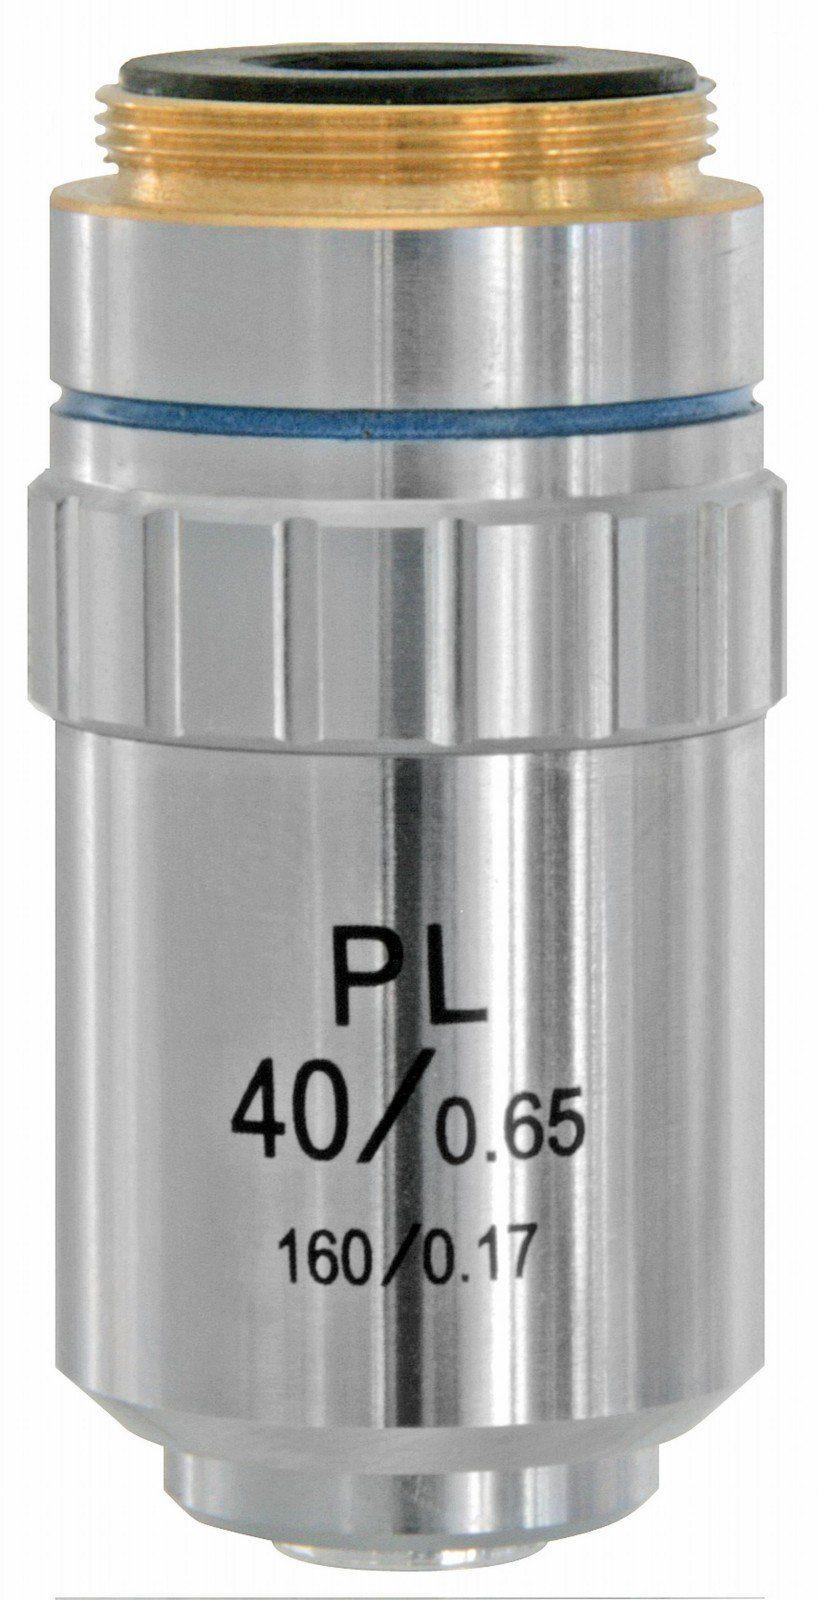 Bresser Mikroskop »BRESSER Planachromat Objektiv 40x«